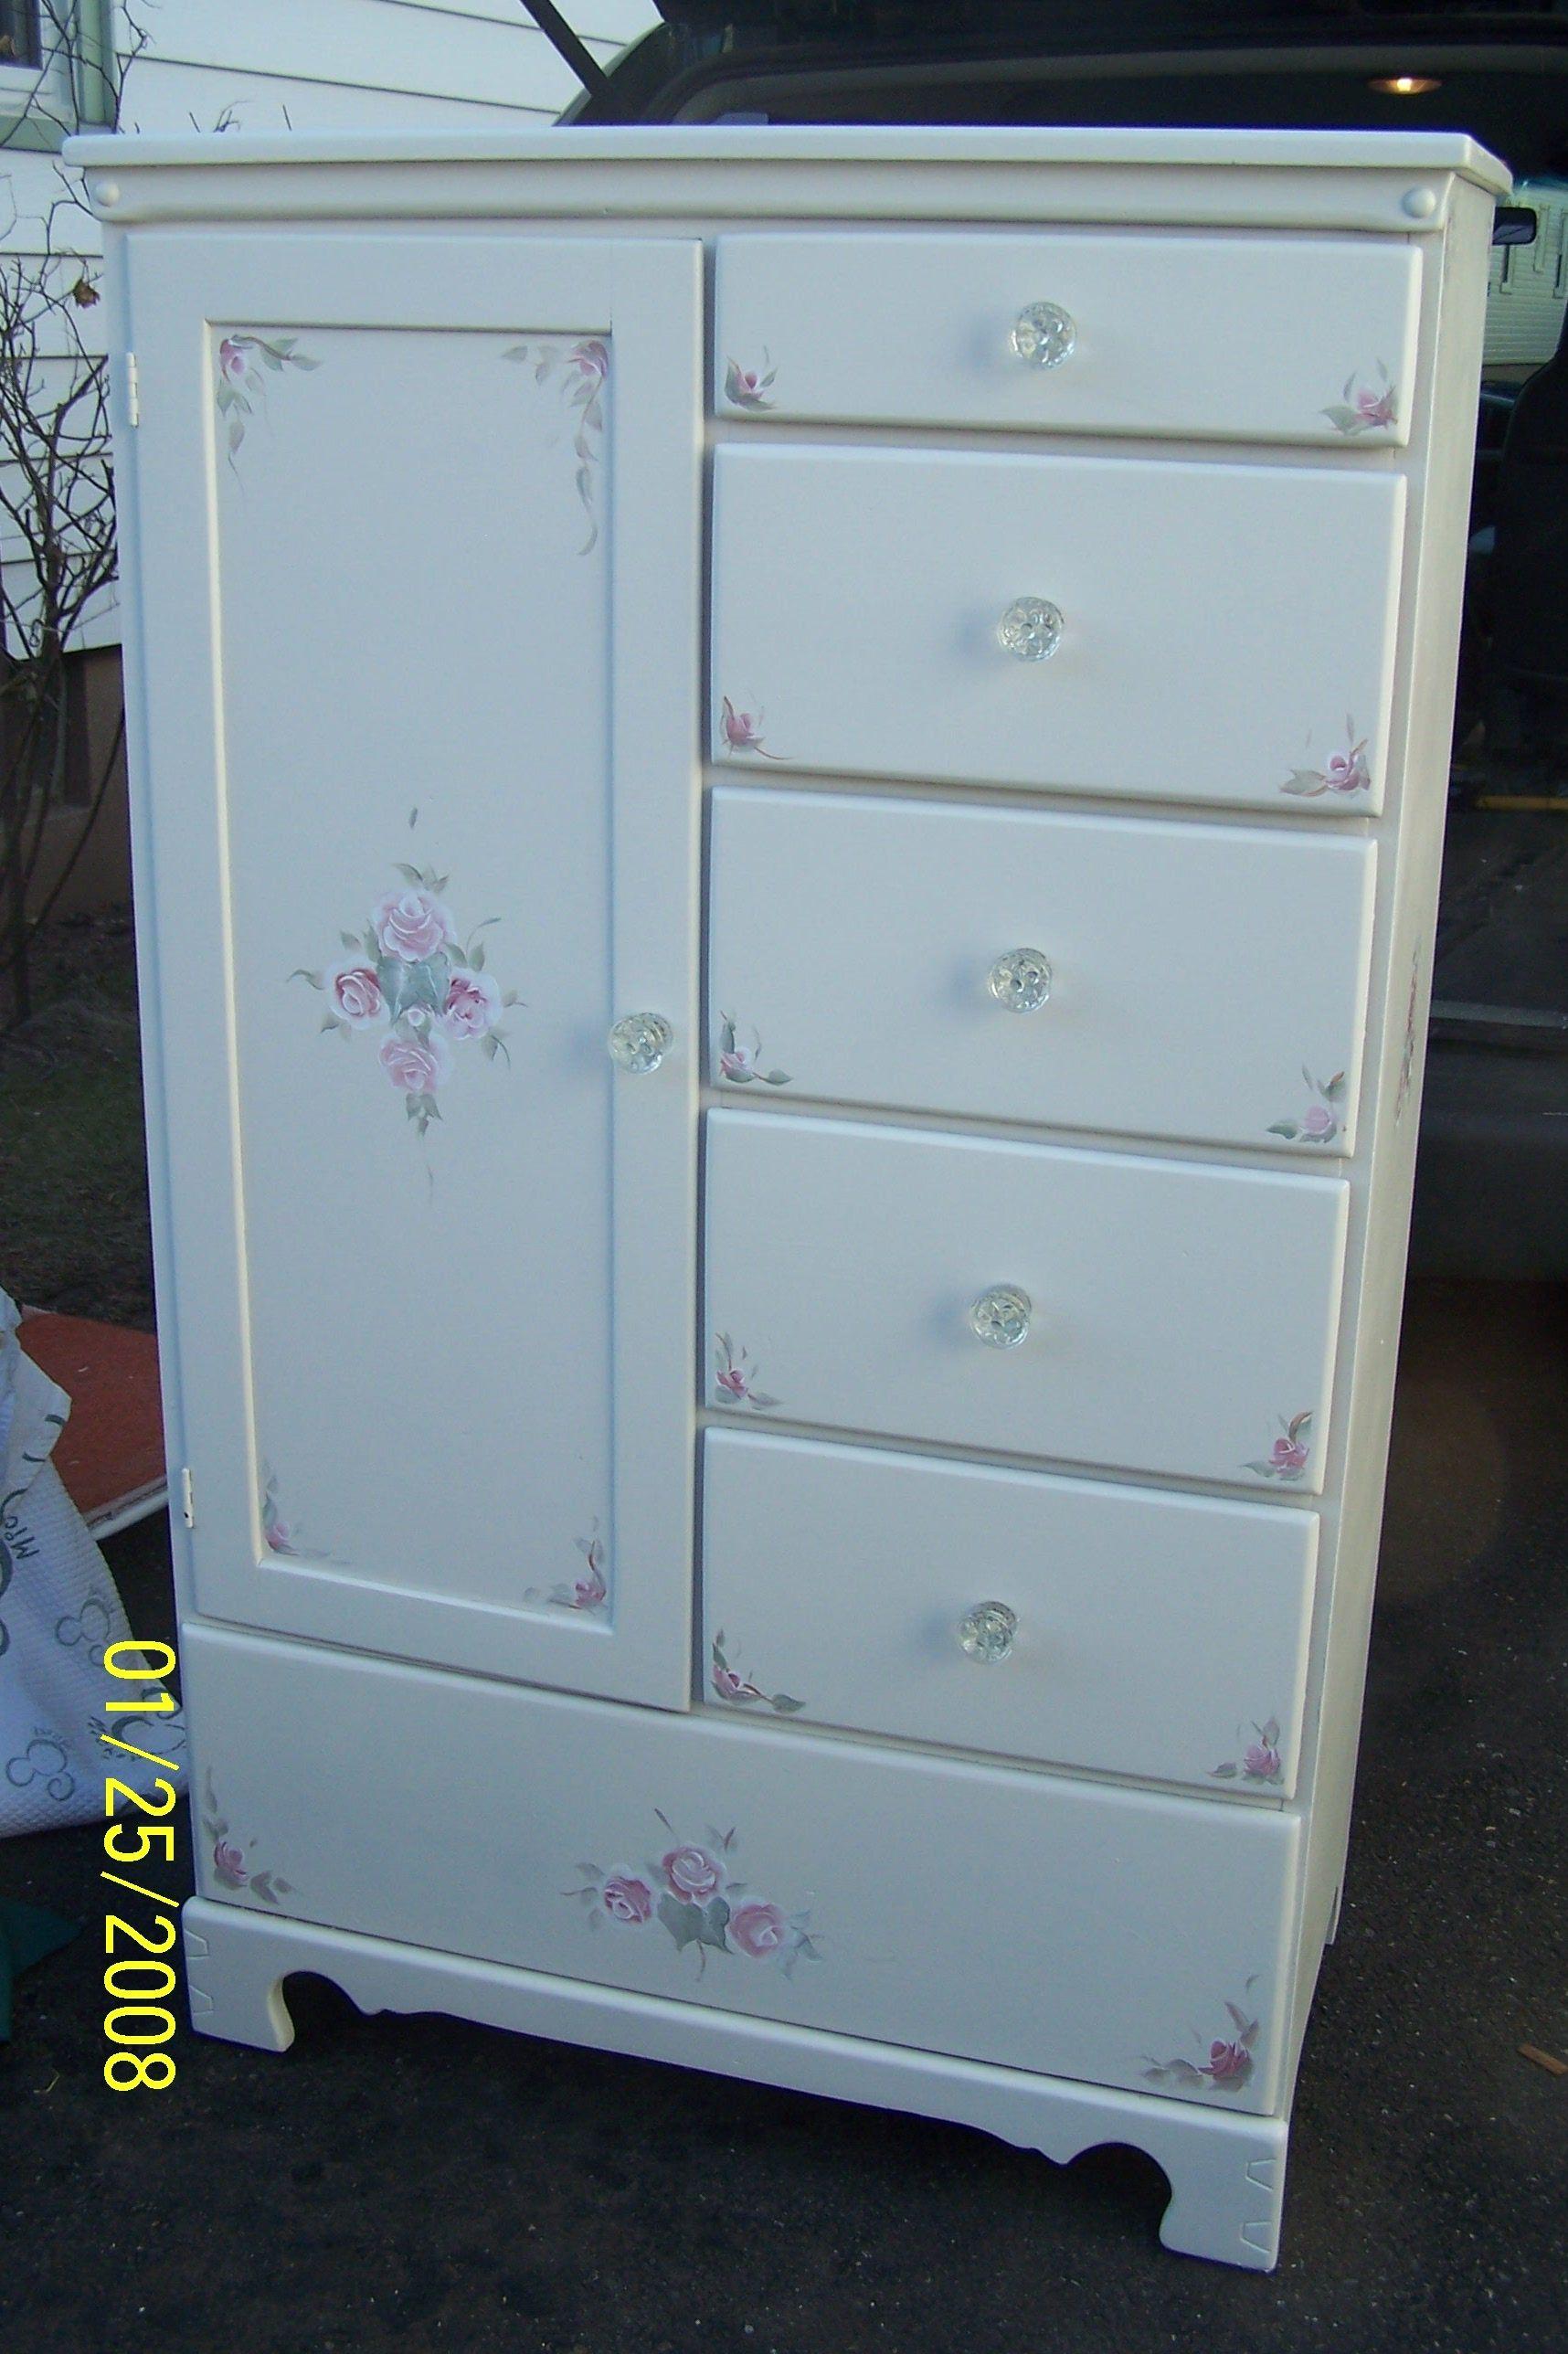 white wood wardrobe armoire shabby chic bedroom. Vintage Painted Shabby Chic Armoire Wardrobe Chifferobe Bedroom Furniture # Shabbychic #vintagefurniture #paintedfurniture White Wood B